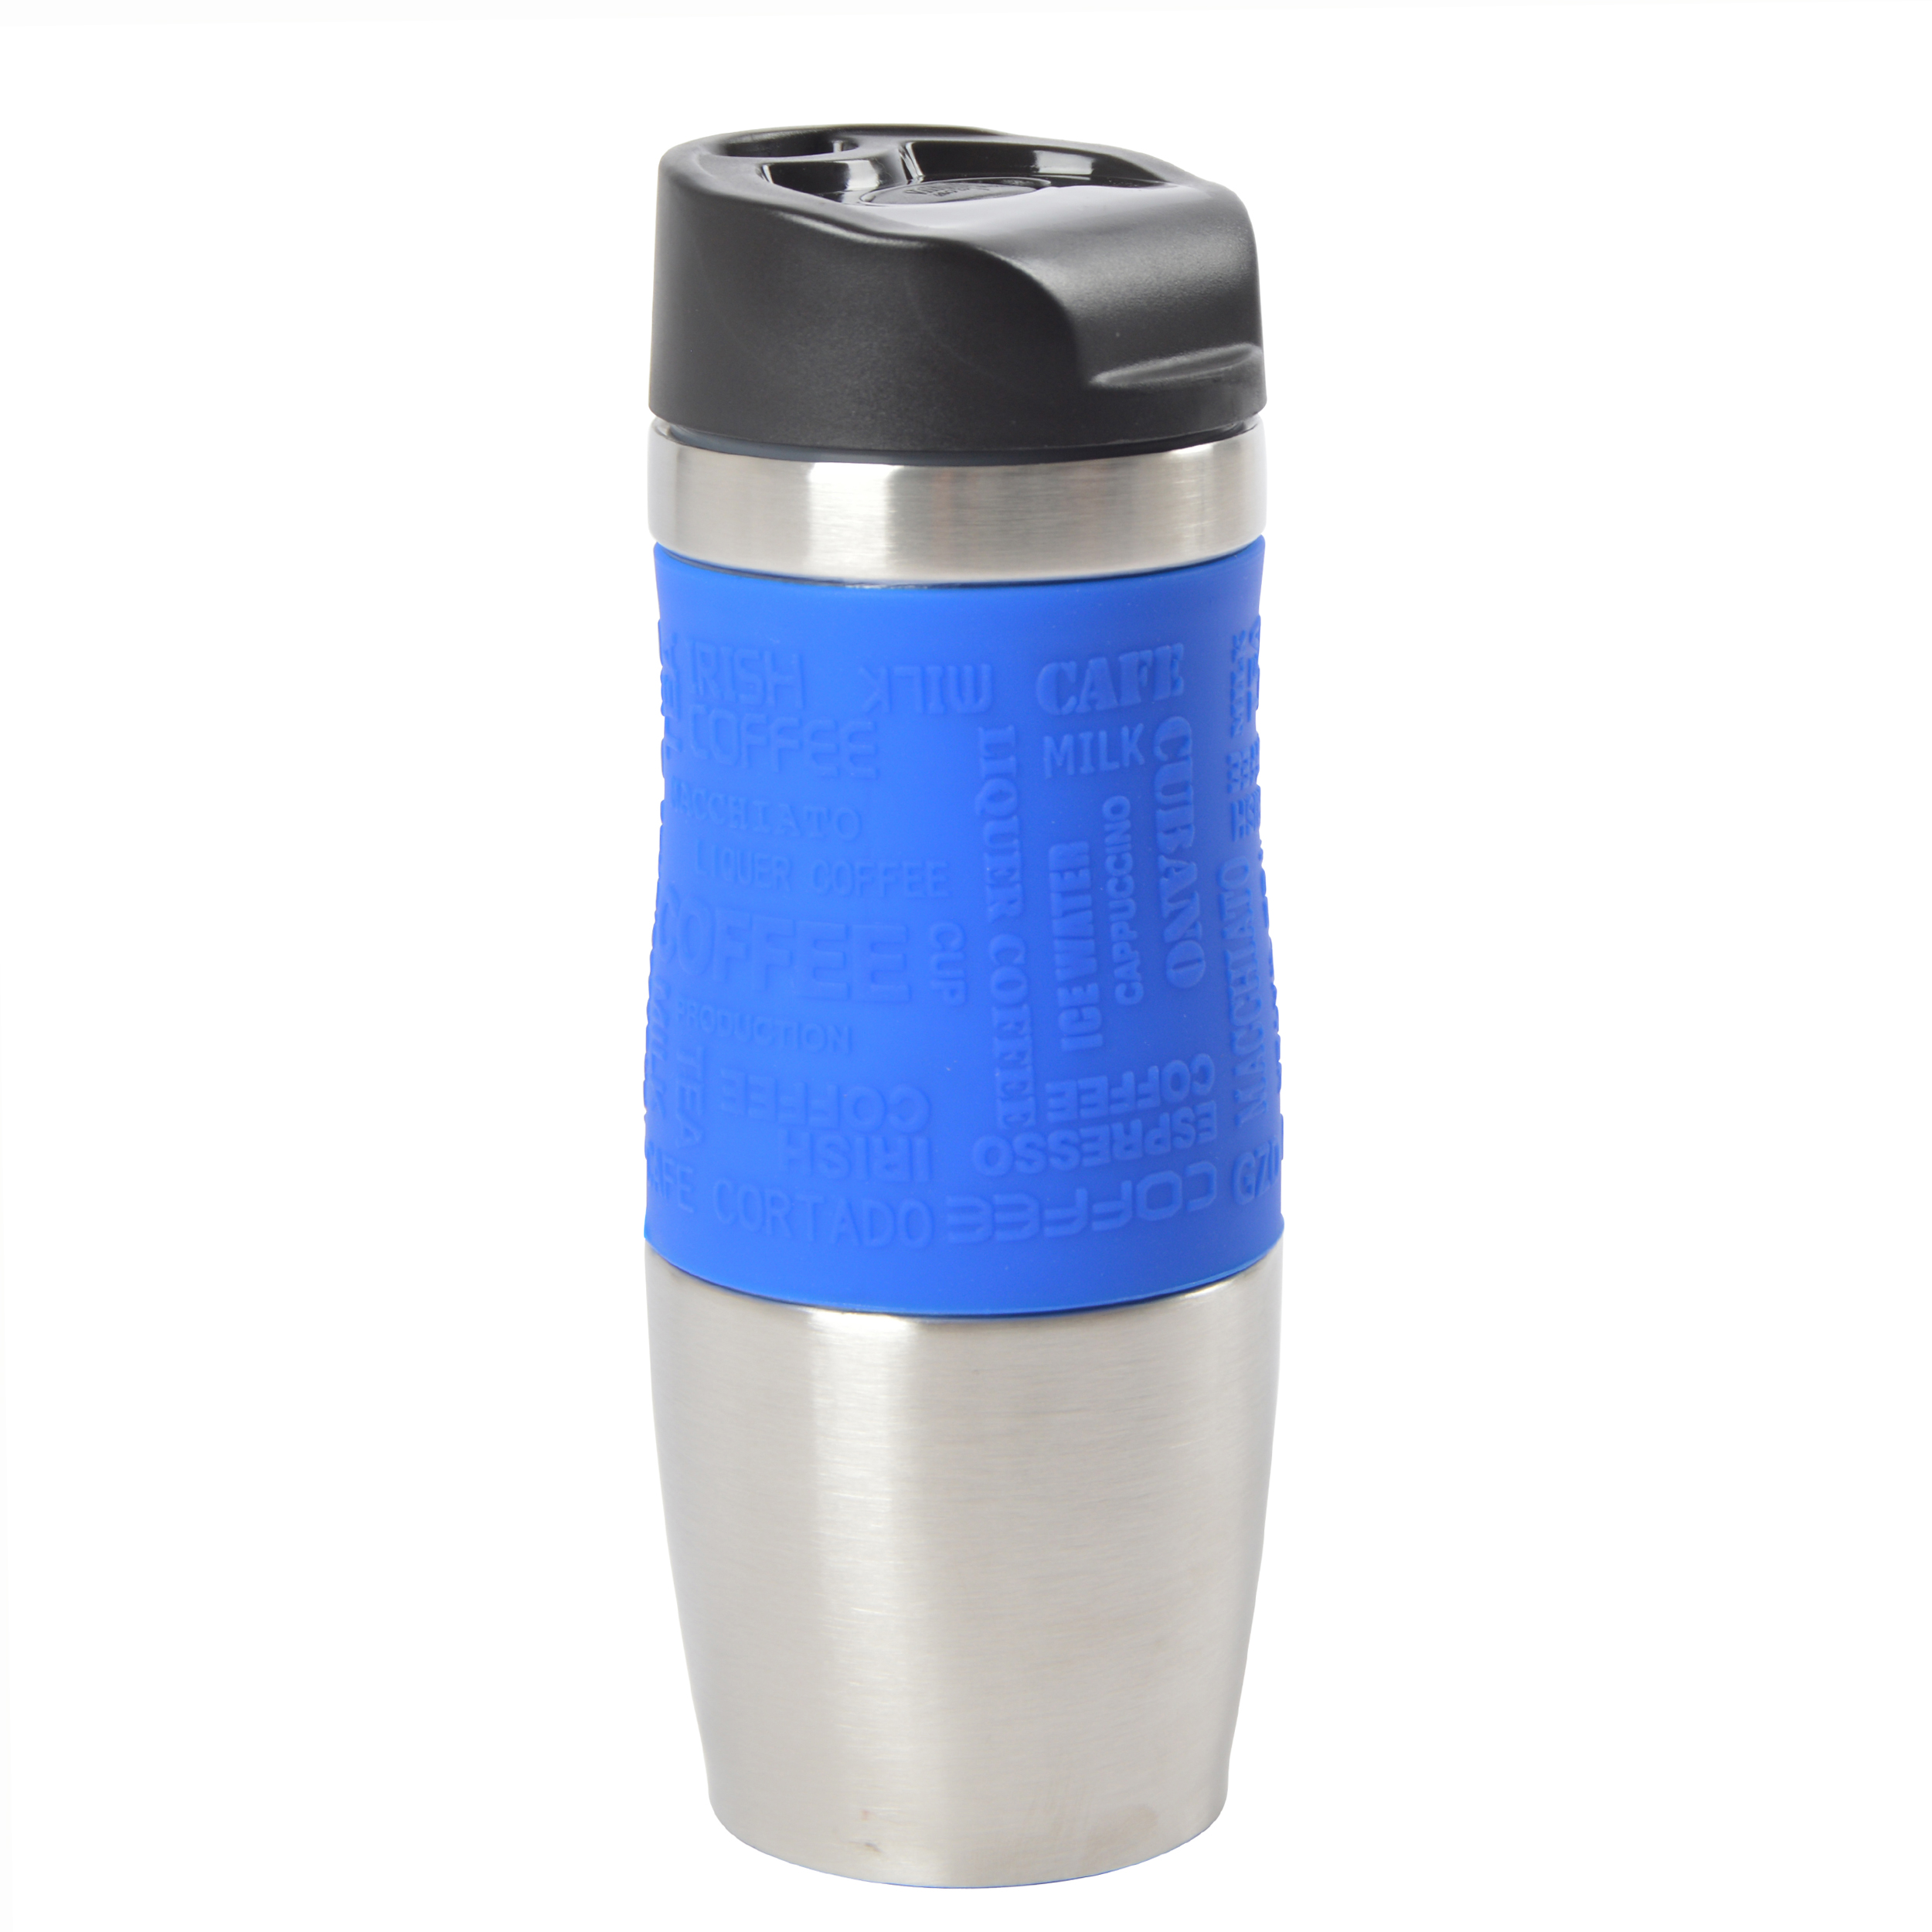 Ocean5 Thermobecher Coffee to go - dunkelblau